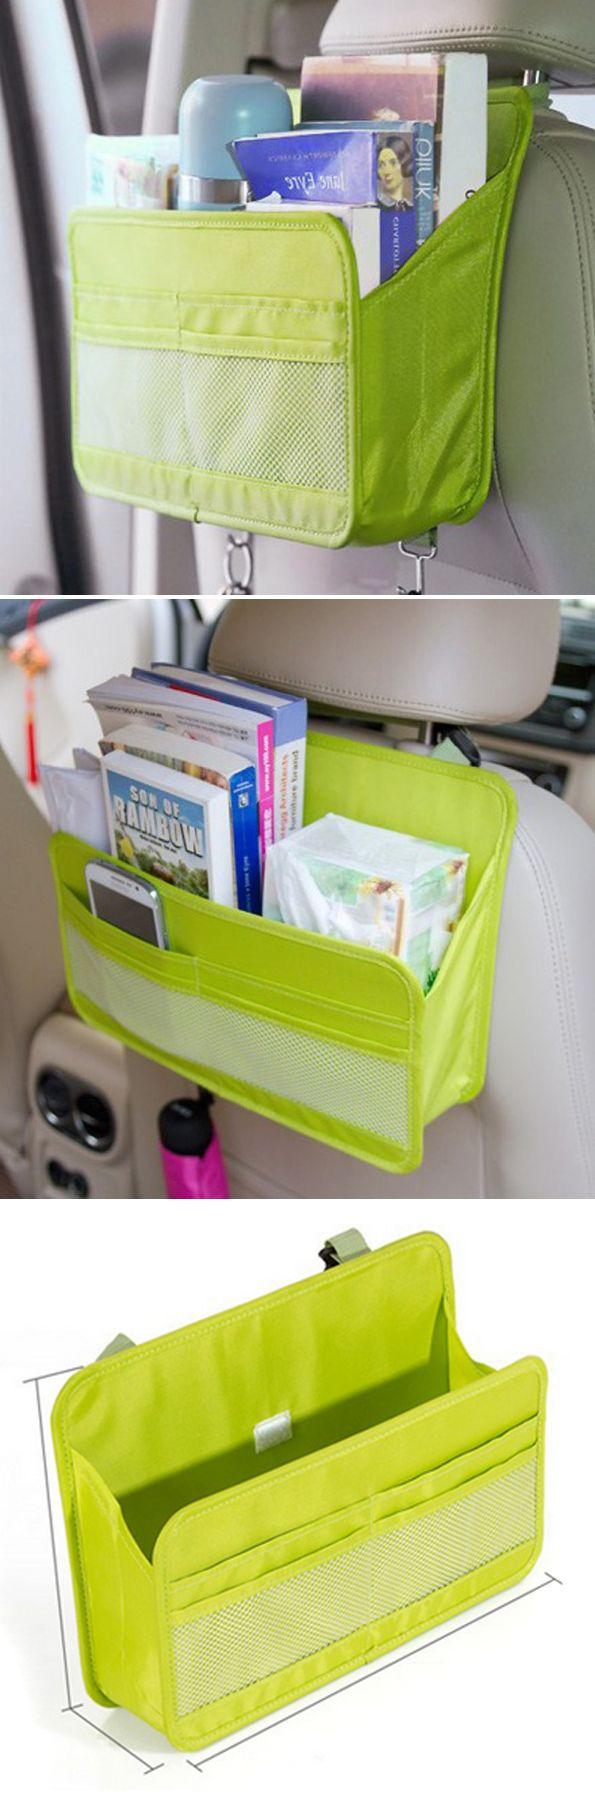 US$5.99 Waterproof Car Storage Box Hanging Organizer Moving Box Oxford Card Holder Storage Container